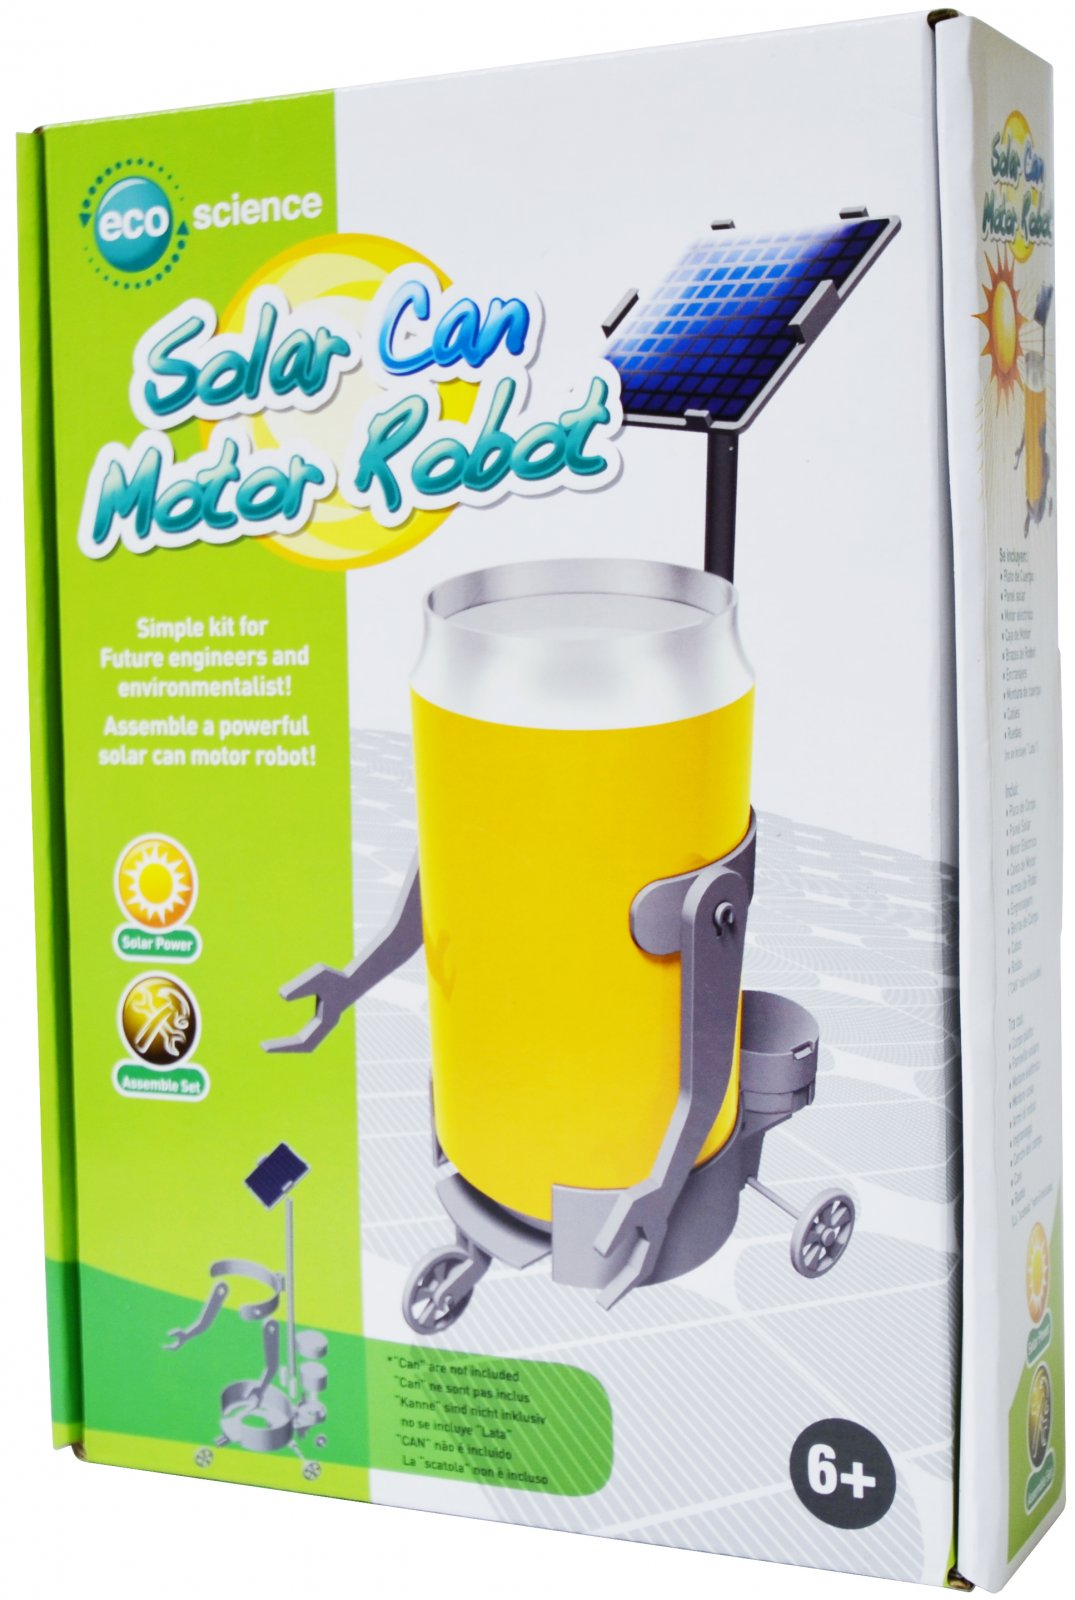 Solar Can Motor Robot